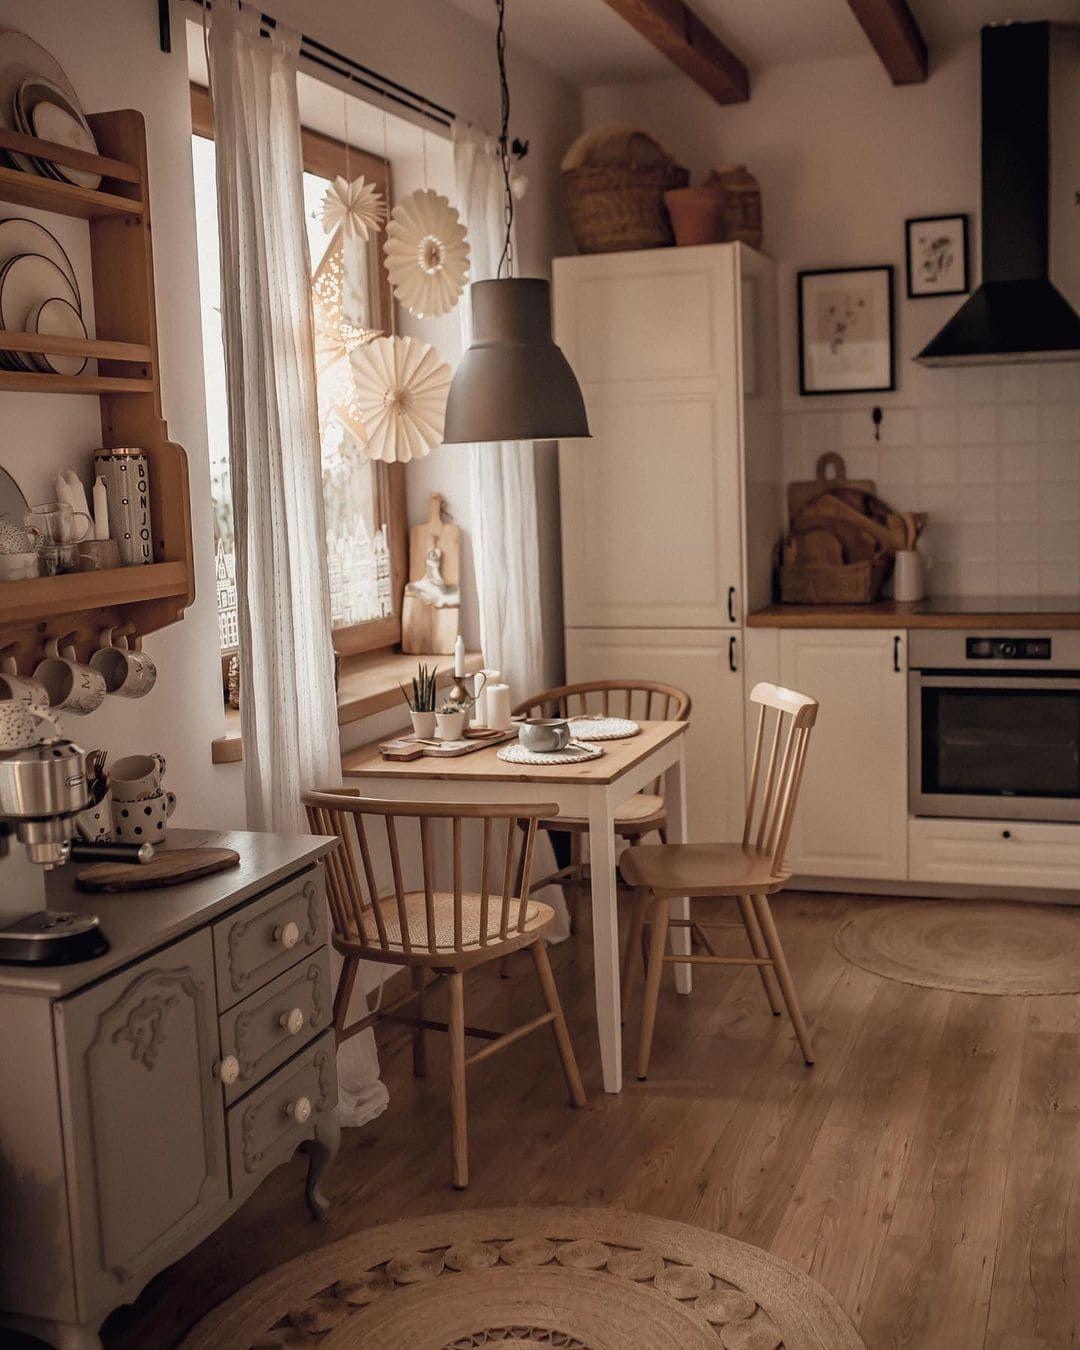 15 New kitchens design ideas with kitchen parts